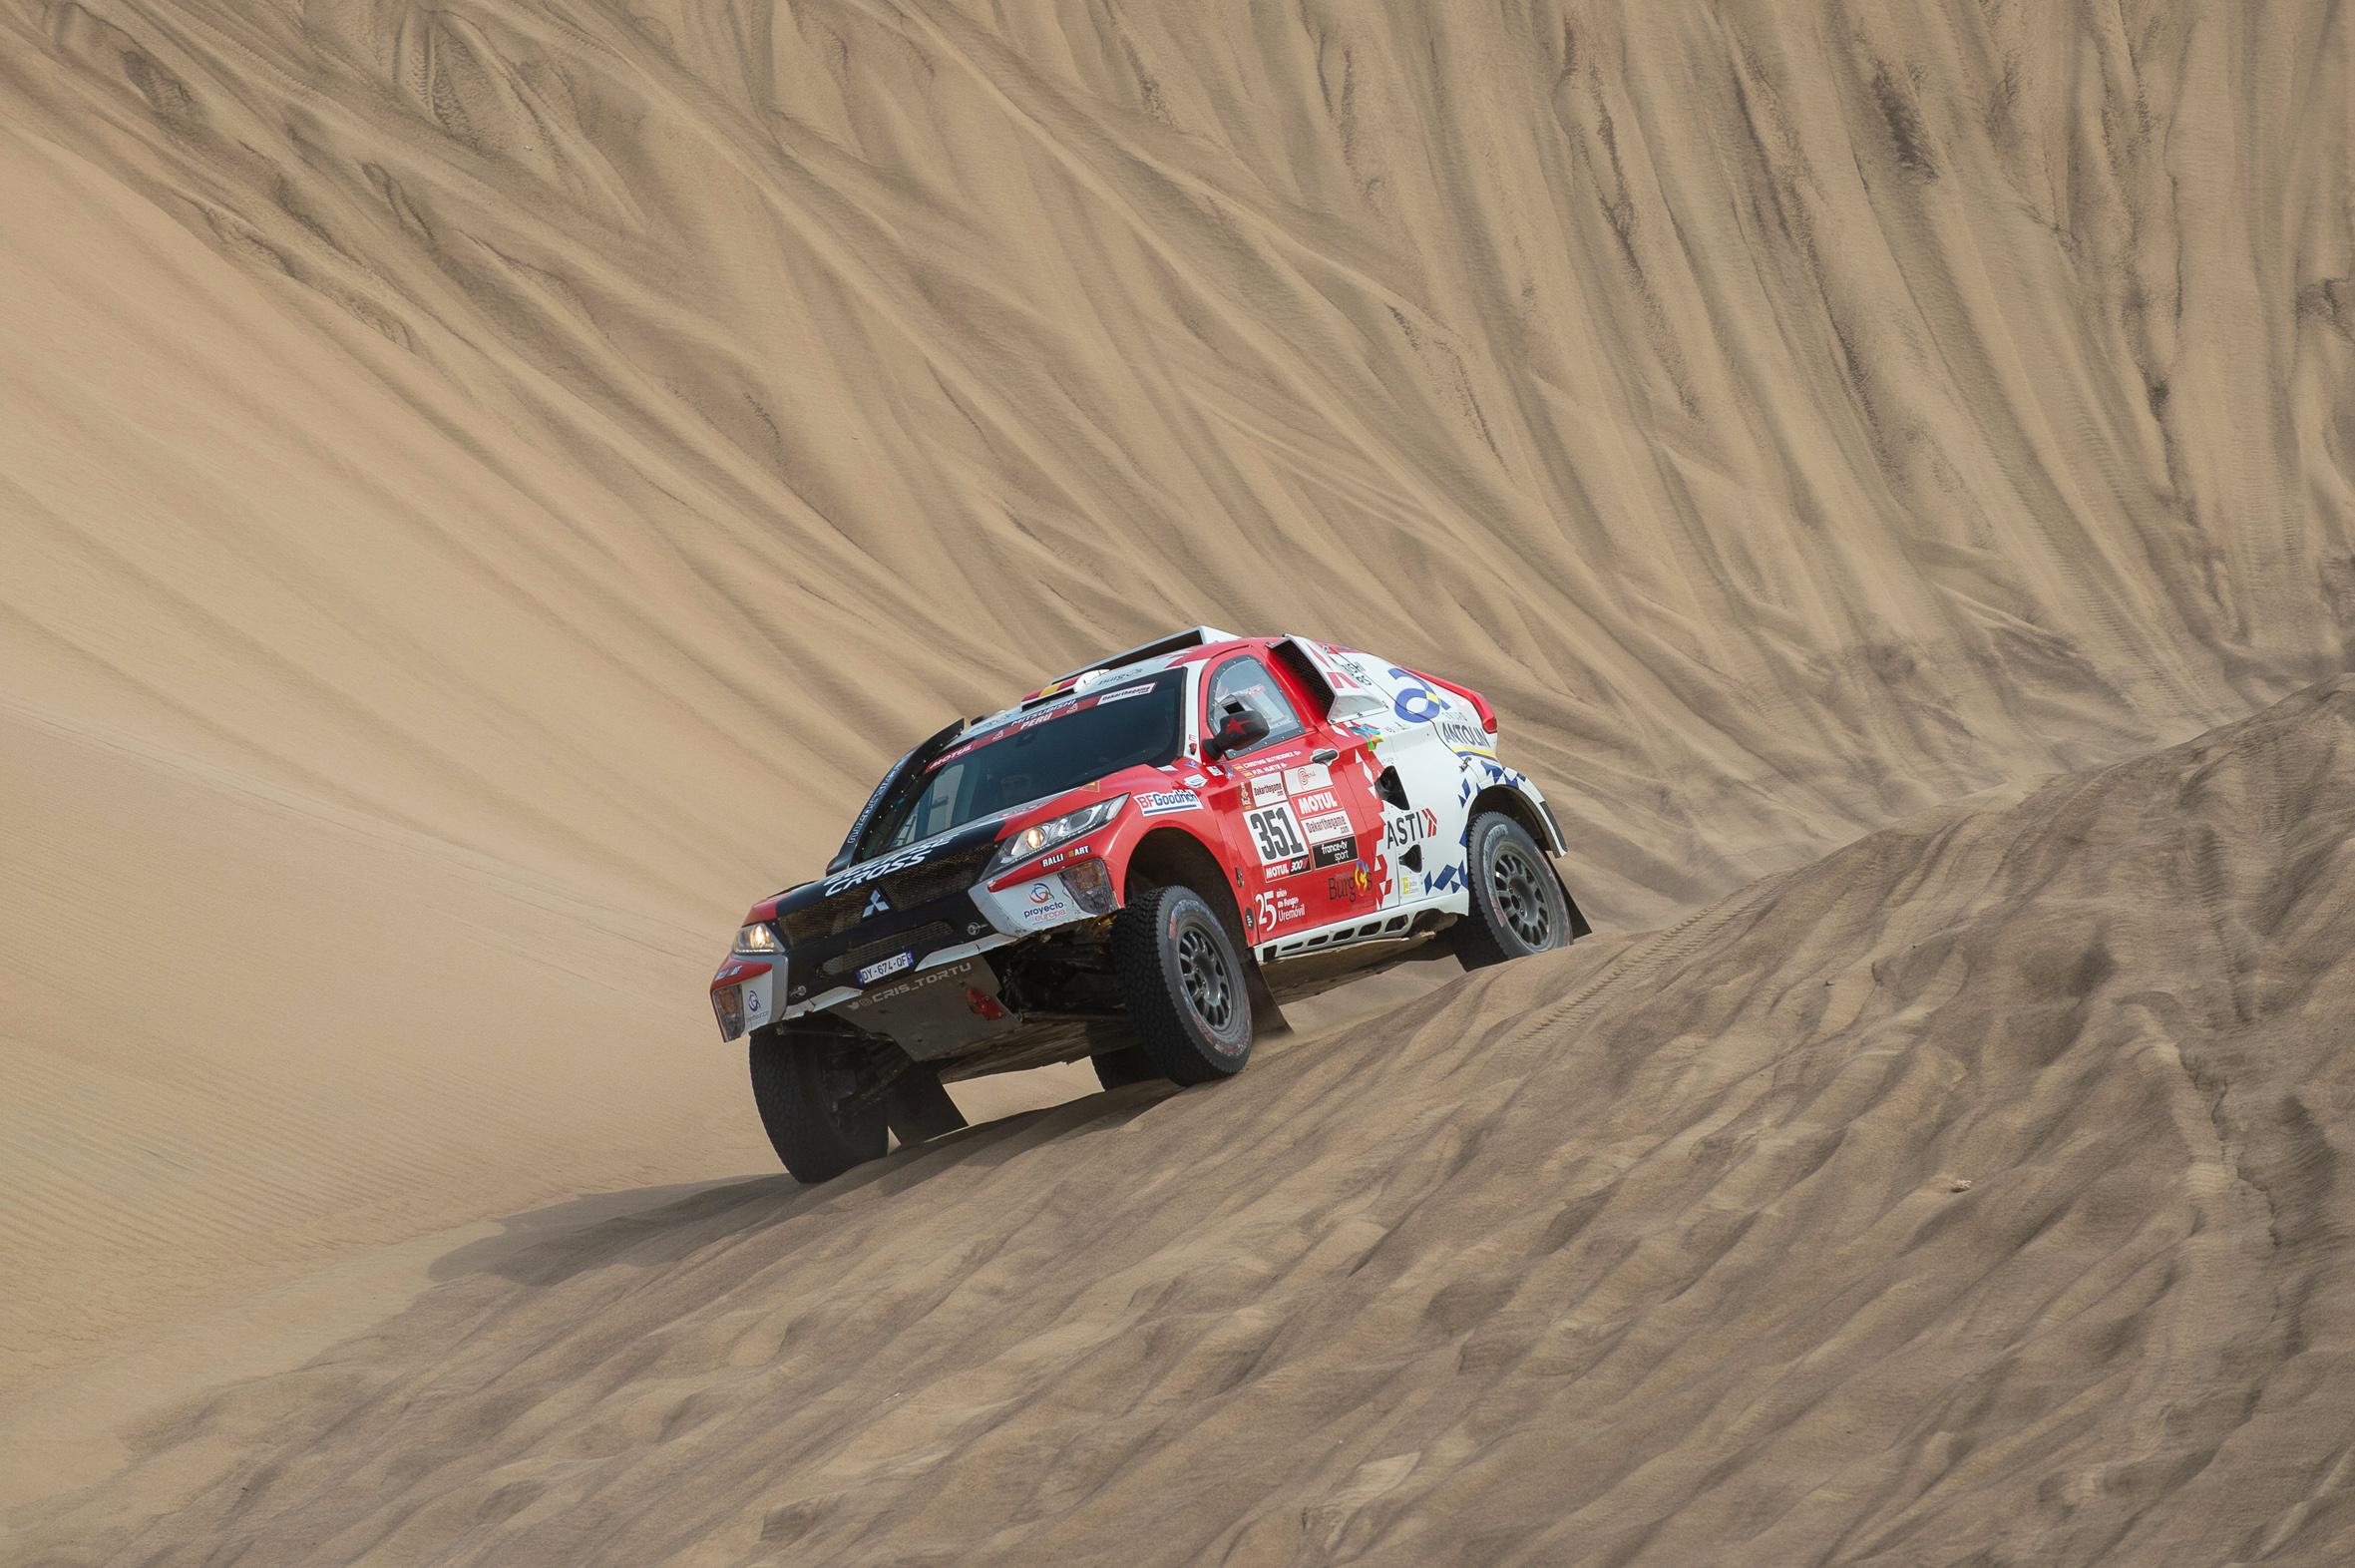 Гонщица Кристина Гутьеррес на Mitsubishi Eclipse Cross Т1 успешно финишировала на ралли Дакар 2019